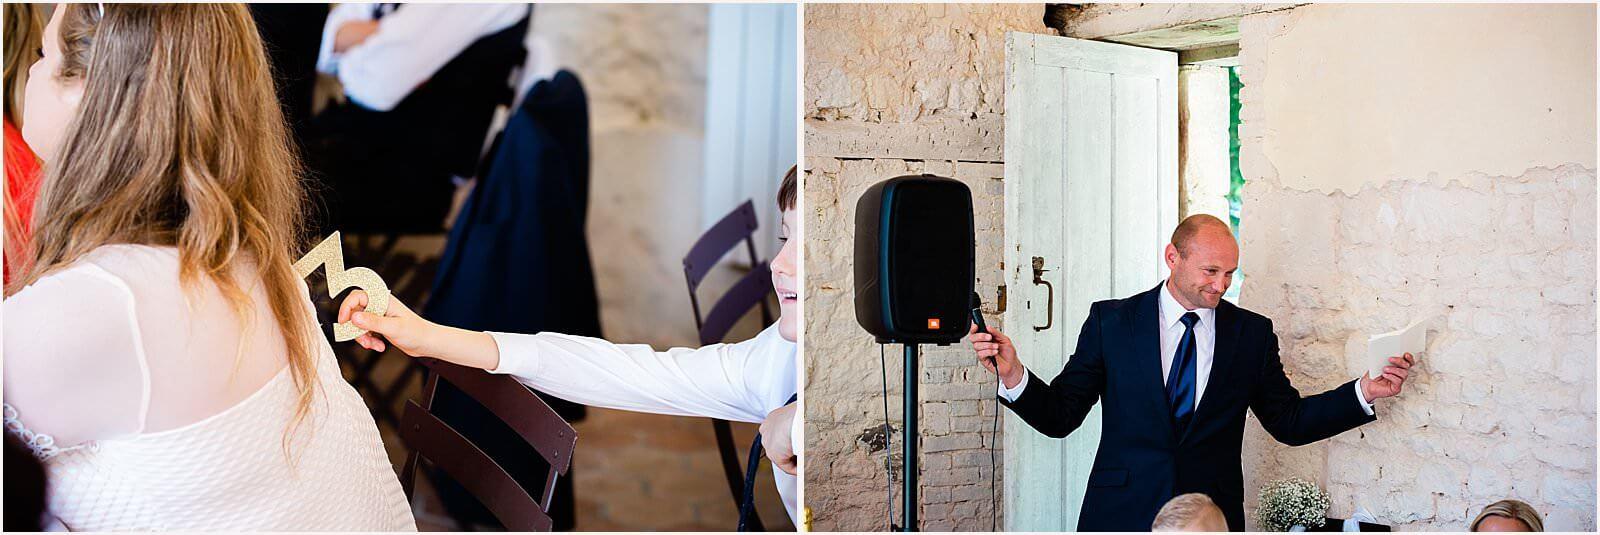 Chateau de Courtomer Wedding | Chantel & Evan 47